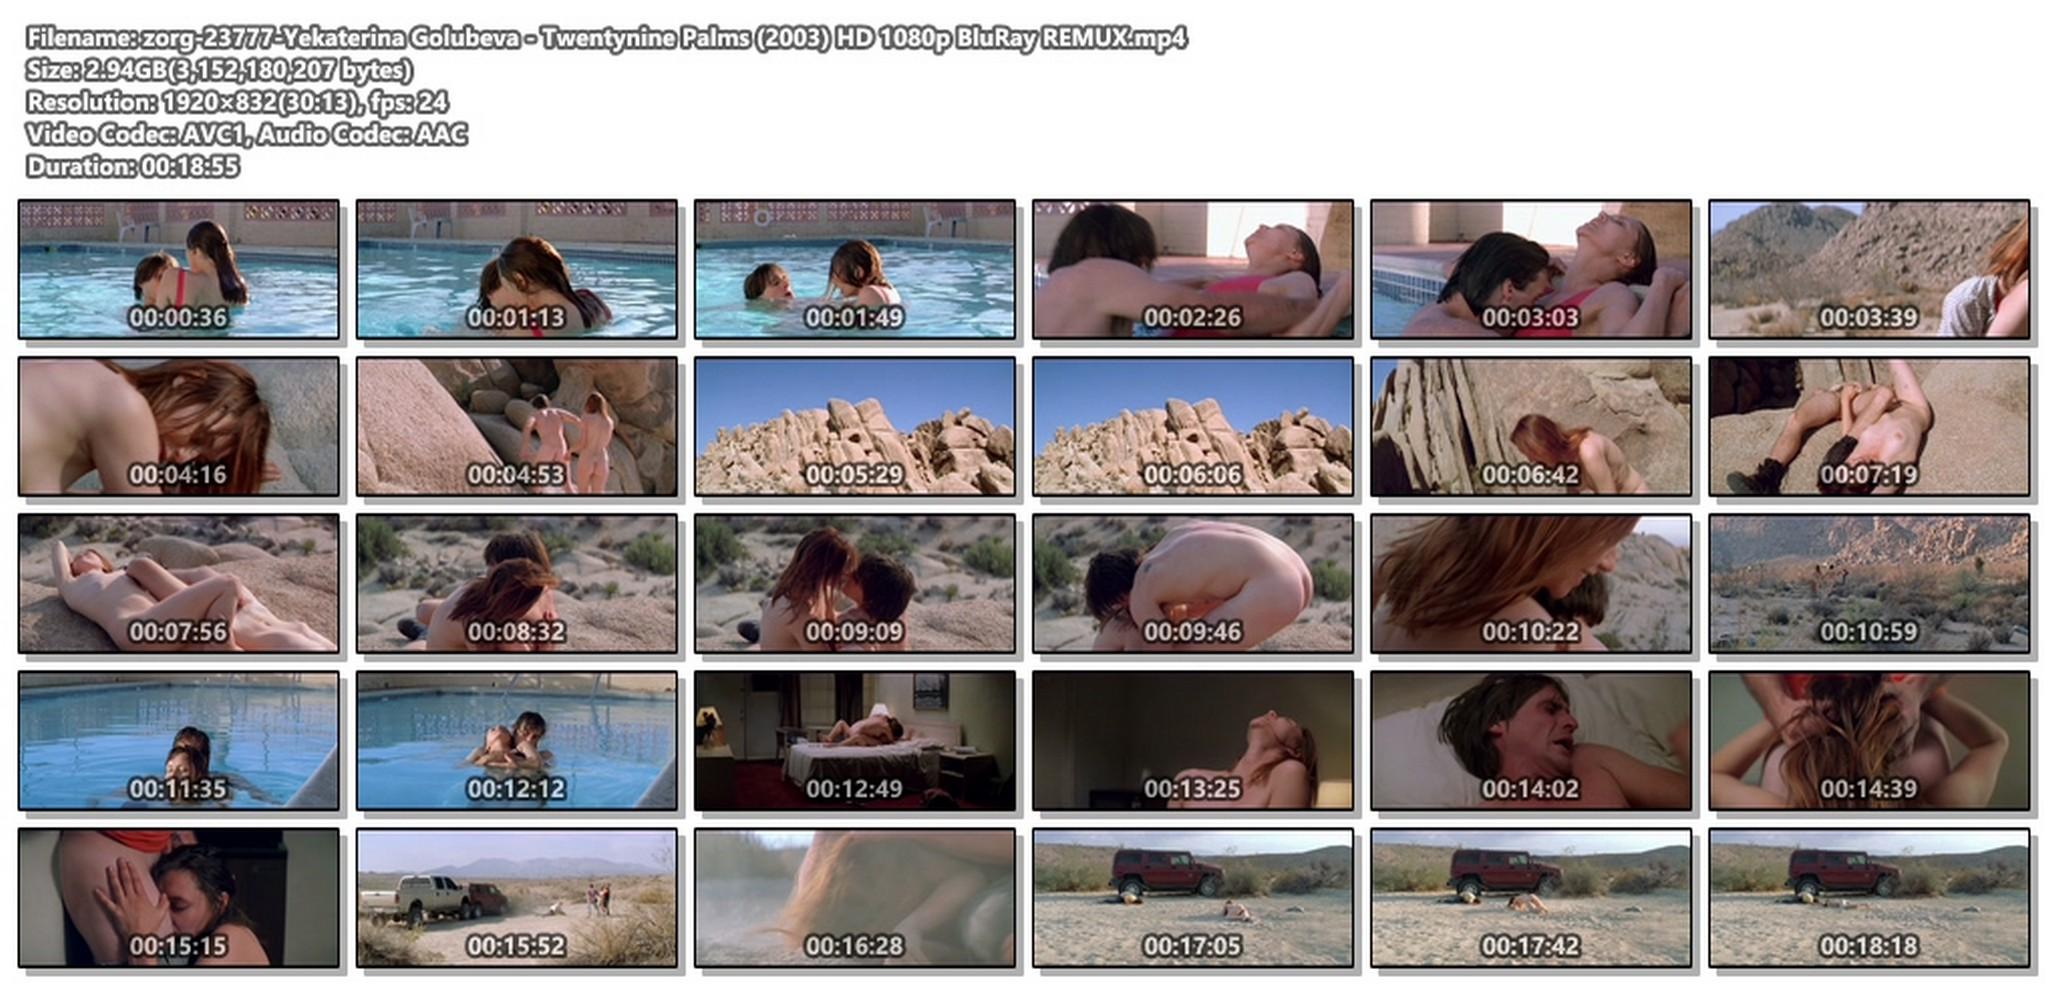 Yekaterina Golubeva nude full frontal explicit sex - Twentynine Palms (2003) HD 1080p BluRay REMUX (1)